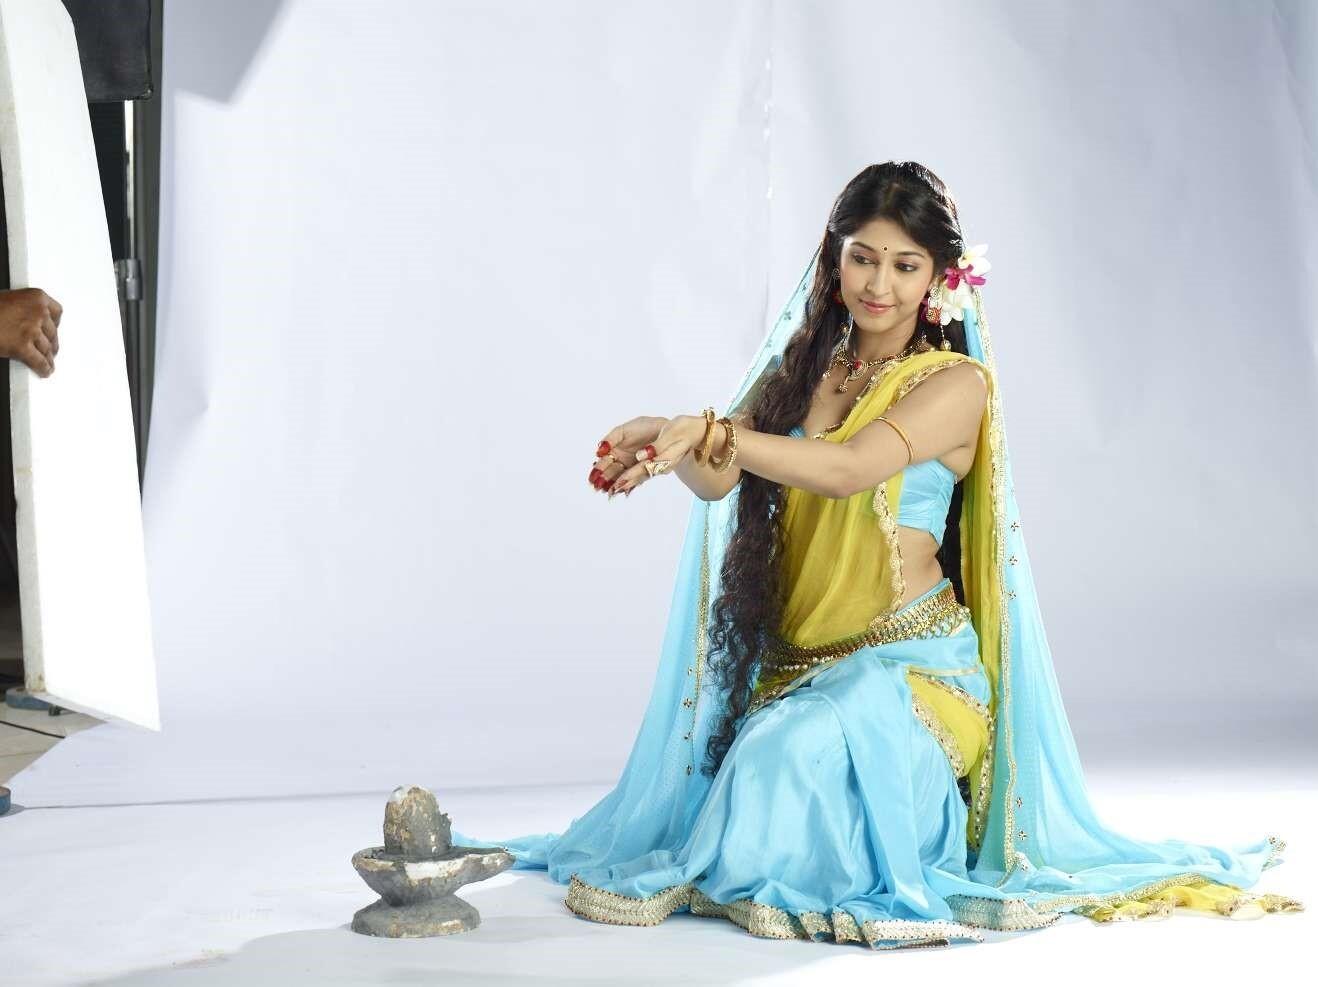 Devon Ke Dev Mahadev Hd Wallpapers Images Pictures Photos Download